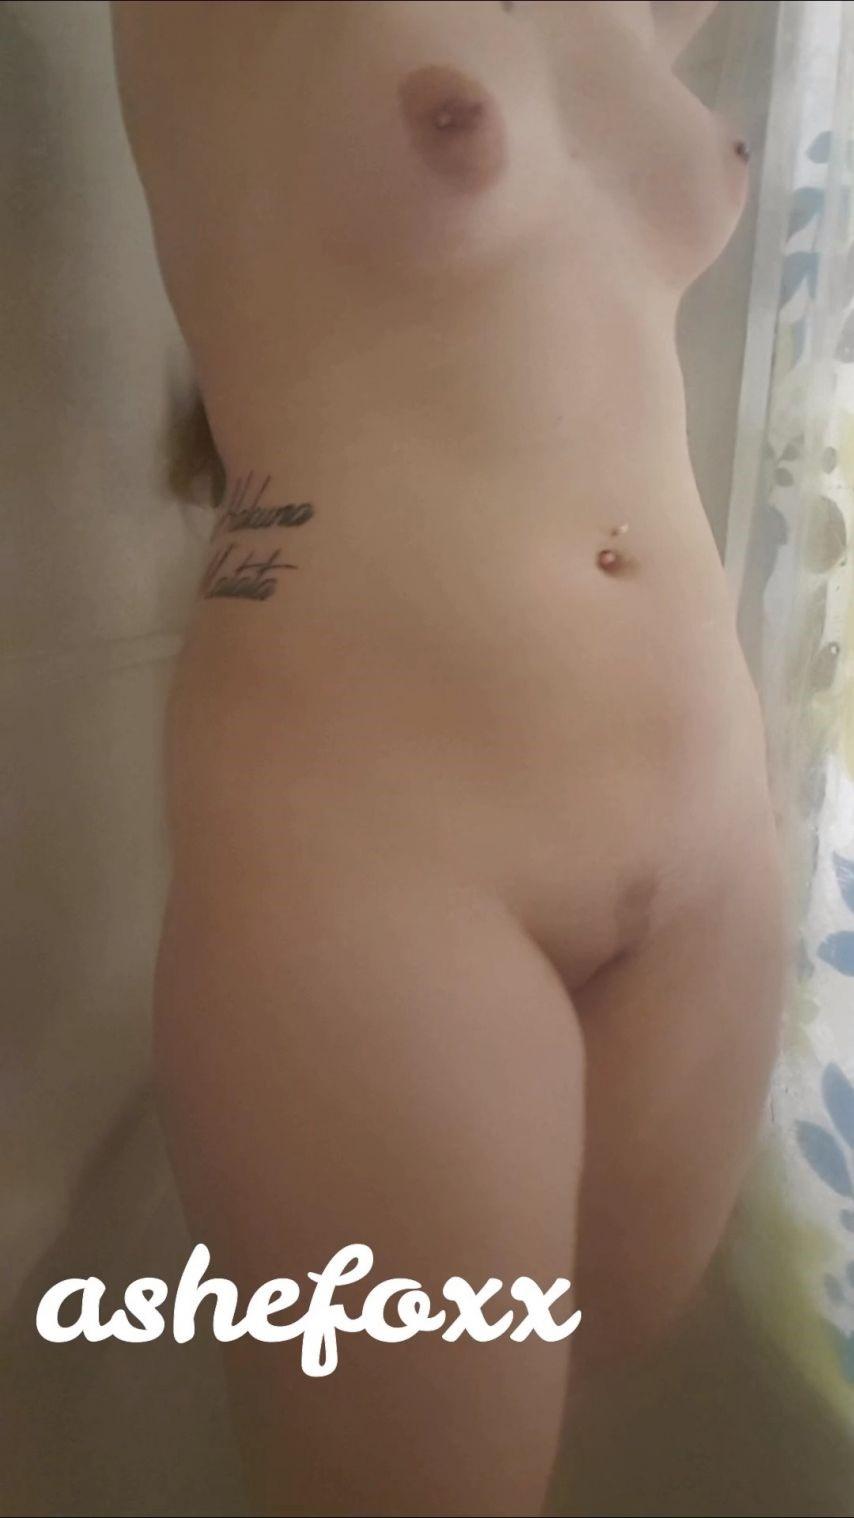 [SD] Ashefoxx Shower Voyeur Spycam Ashefoxx - ManyVids-00:08:13 | Shower,Shower Scenes,Nudity/Naked,Solo Female,Piercings - 482,3 MB